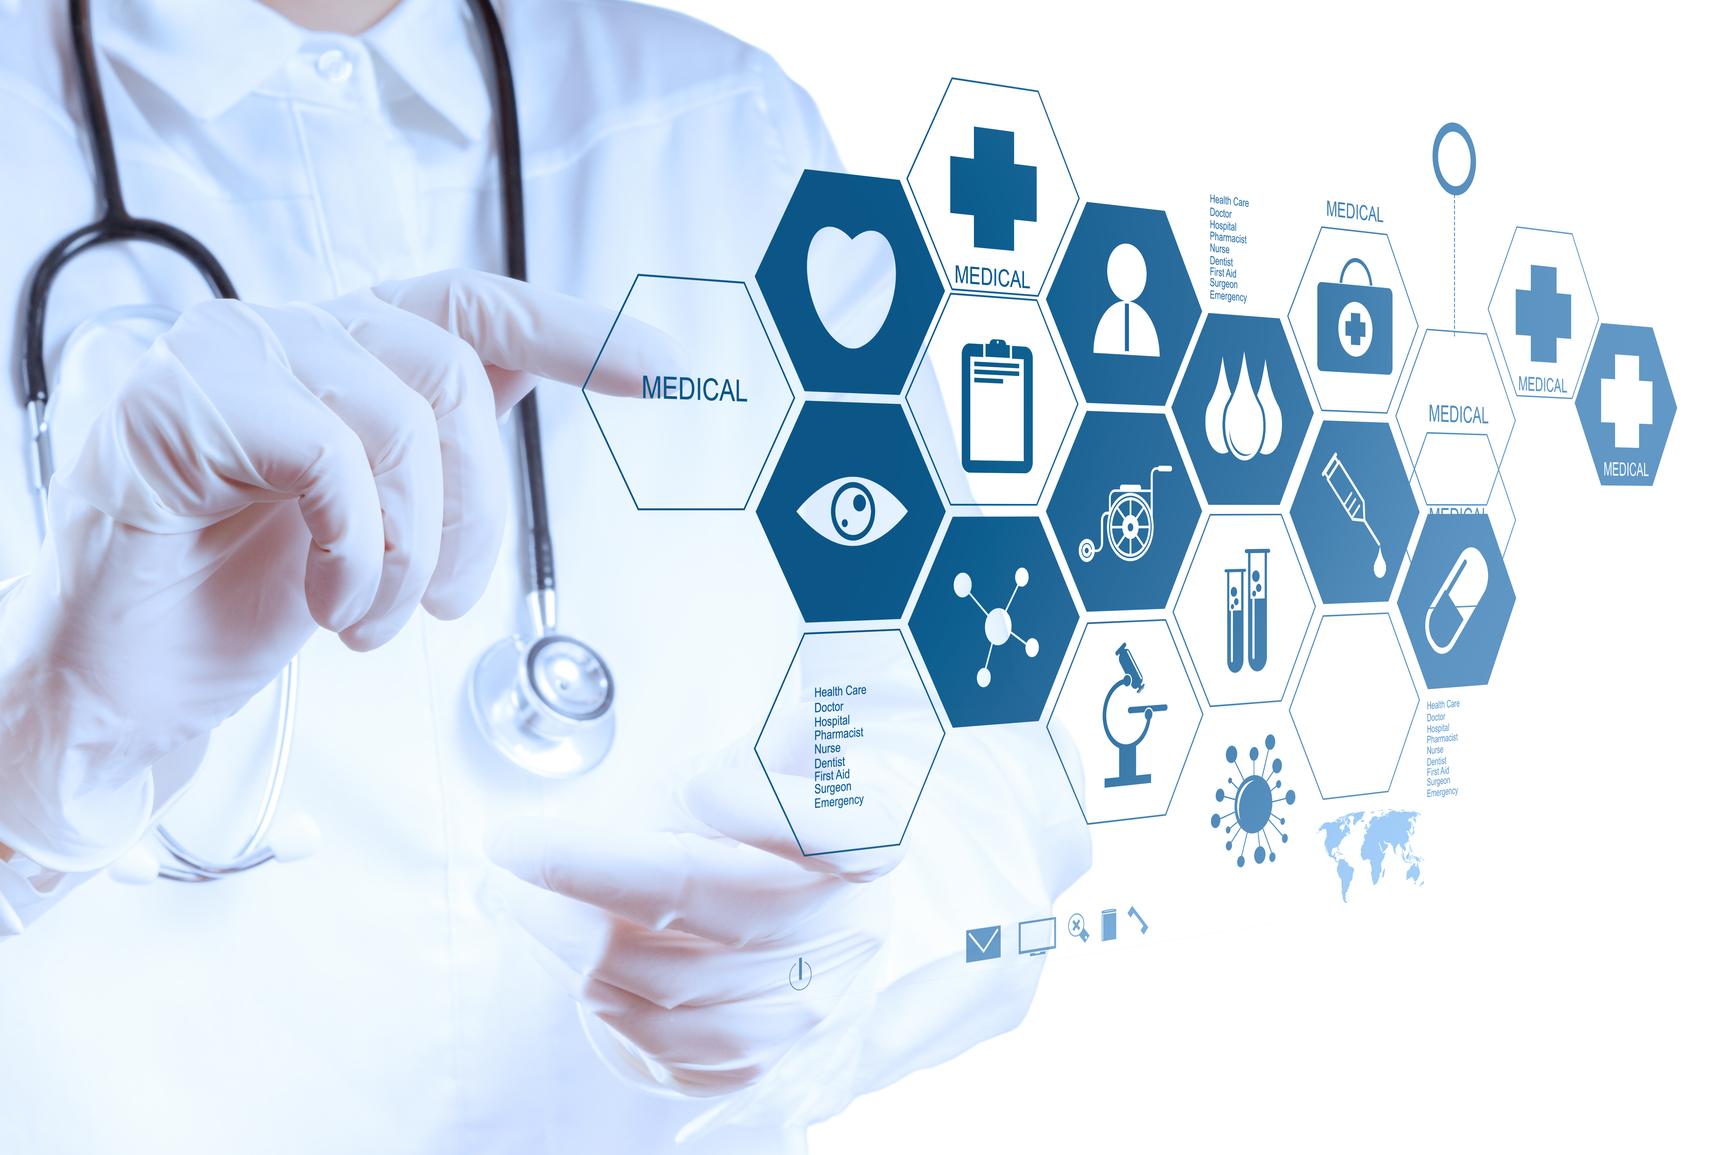 https://cdn2.hubspot.net/hub/62006/file-889628455-jpg/images/future_of_medicine_with_ehr.jpg